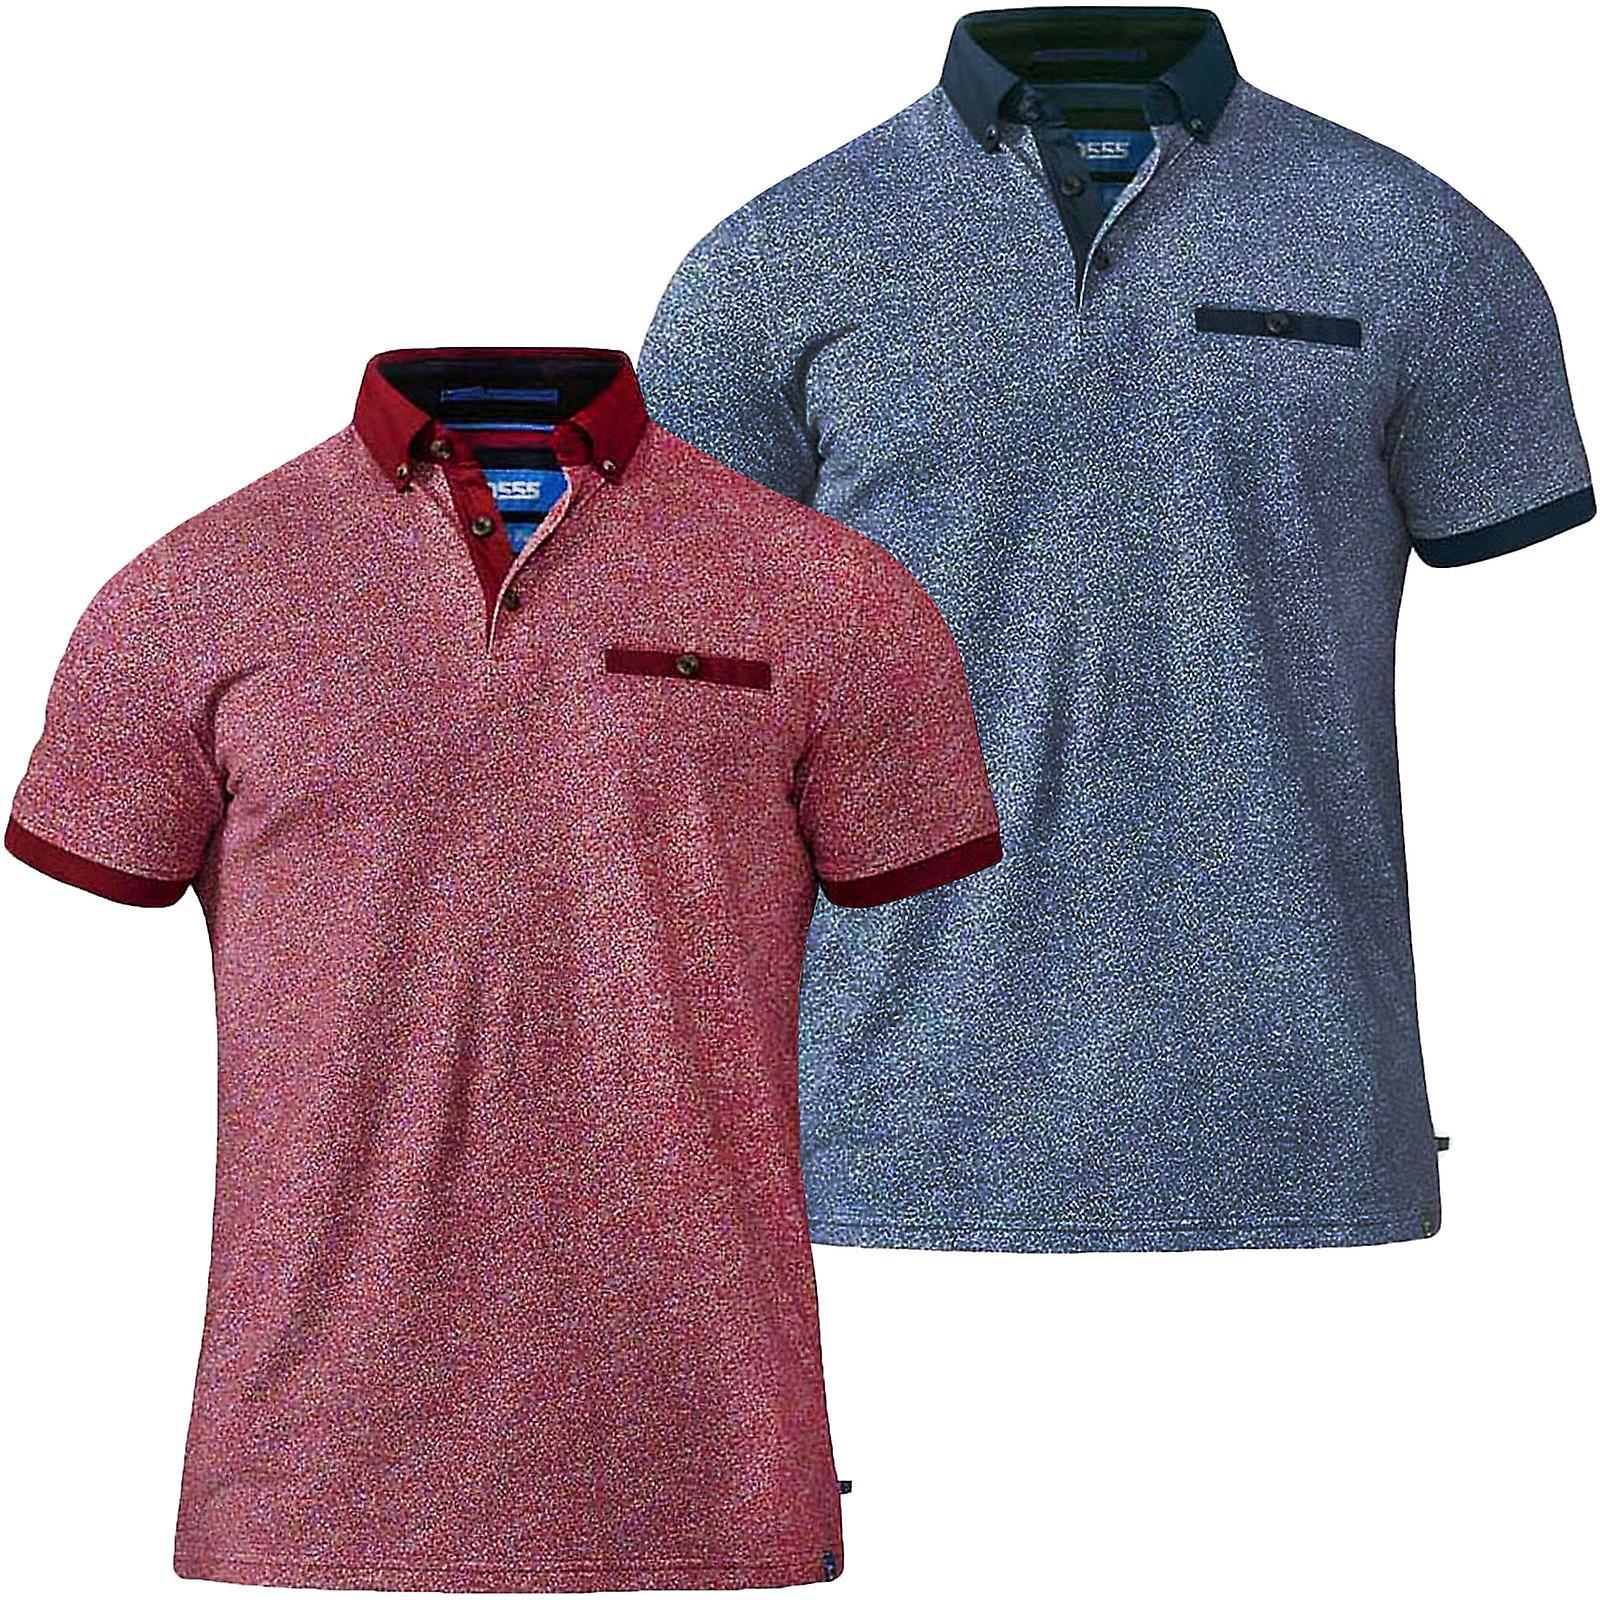 D555 Duke Mens Duncan Big Tall King Size Short Sleeve Solid Polo Shirt Top